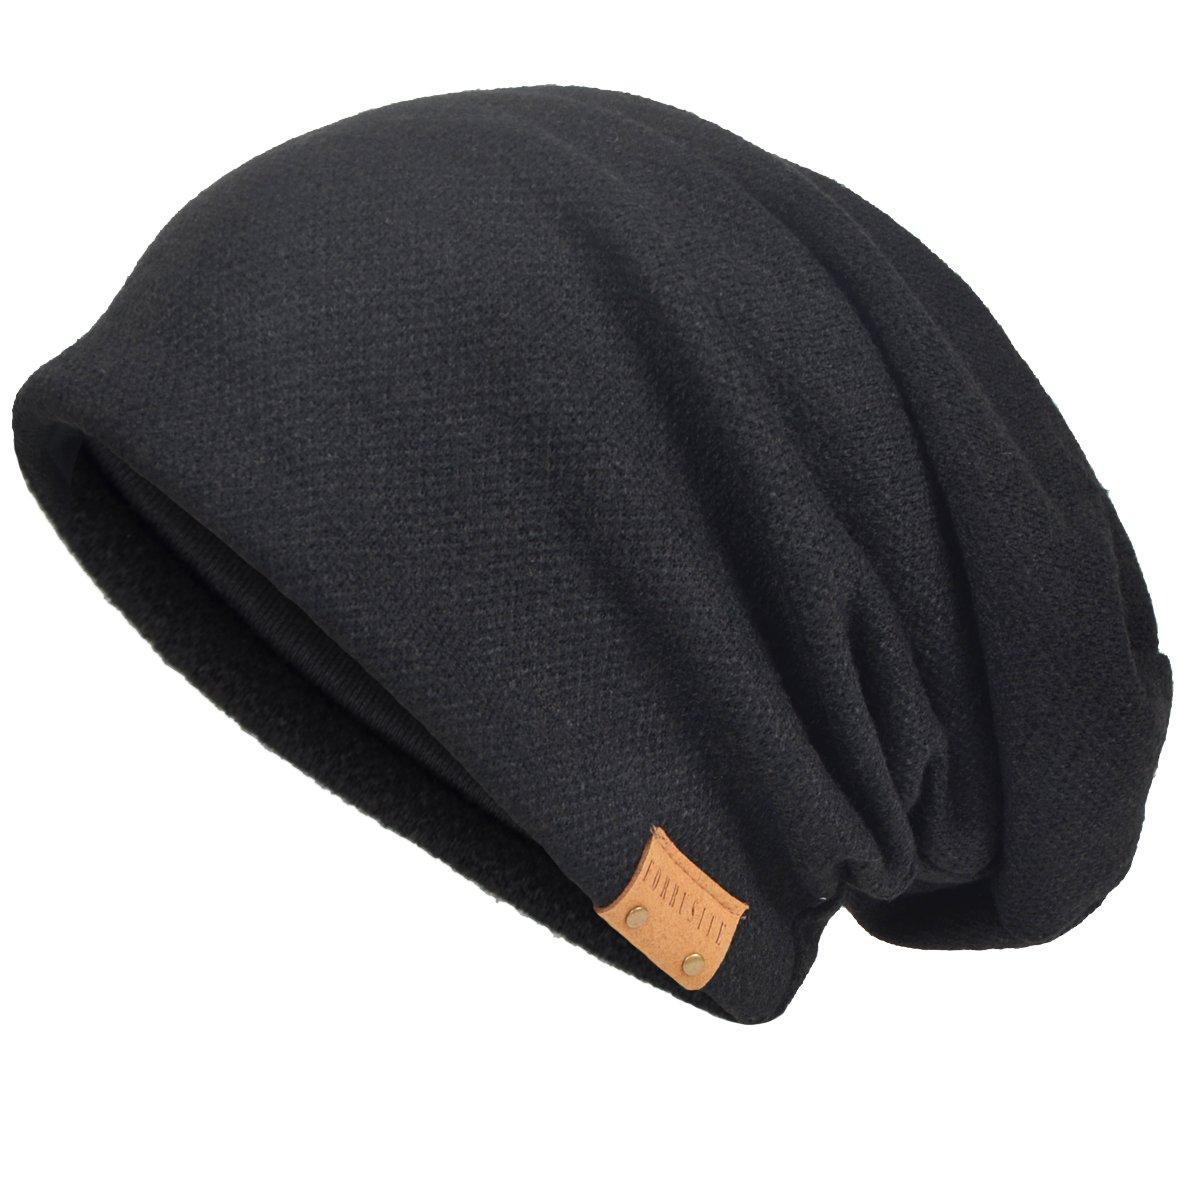 dac885c132c VECRY Men s Cool Cotton Beanie Slouch Skull Cap Long Baggy Hip-hop Winter  Summer Hat (Black) at Amazon Men s Clothing store